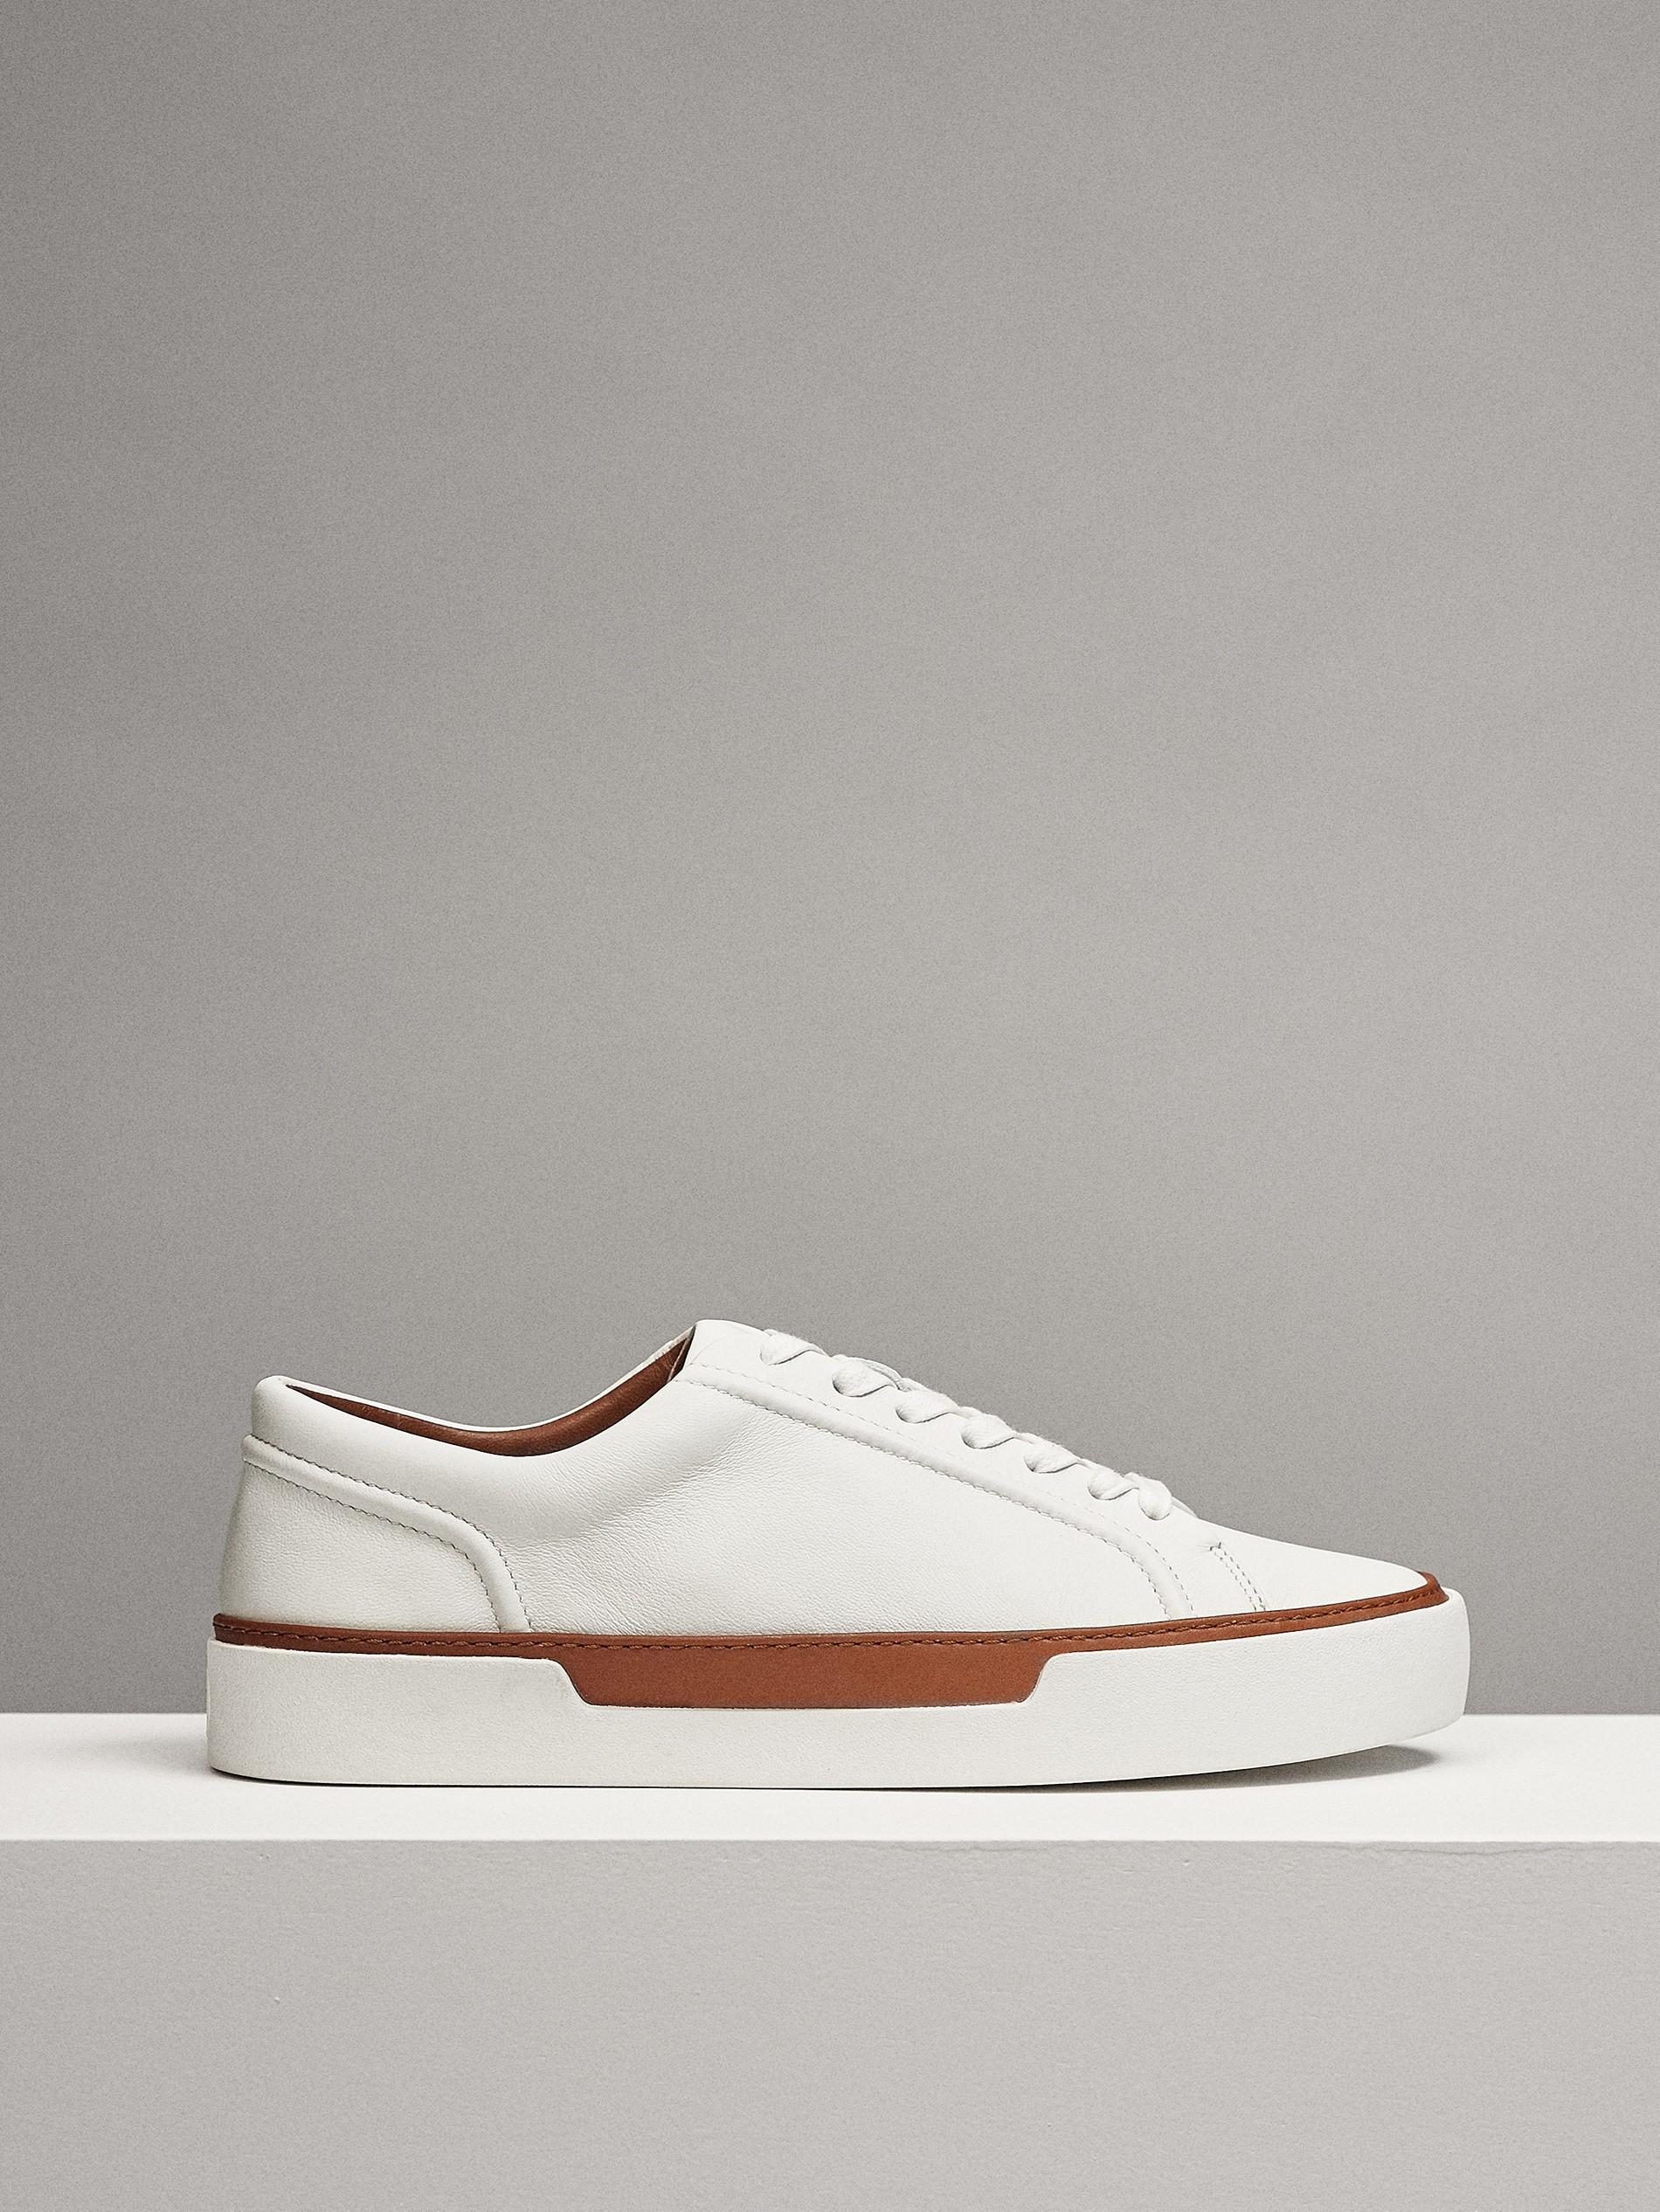 Massimo Deutschland Kollektion Damen Dutti Sqtrchd Sneaker Schuhe O80XwPnk